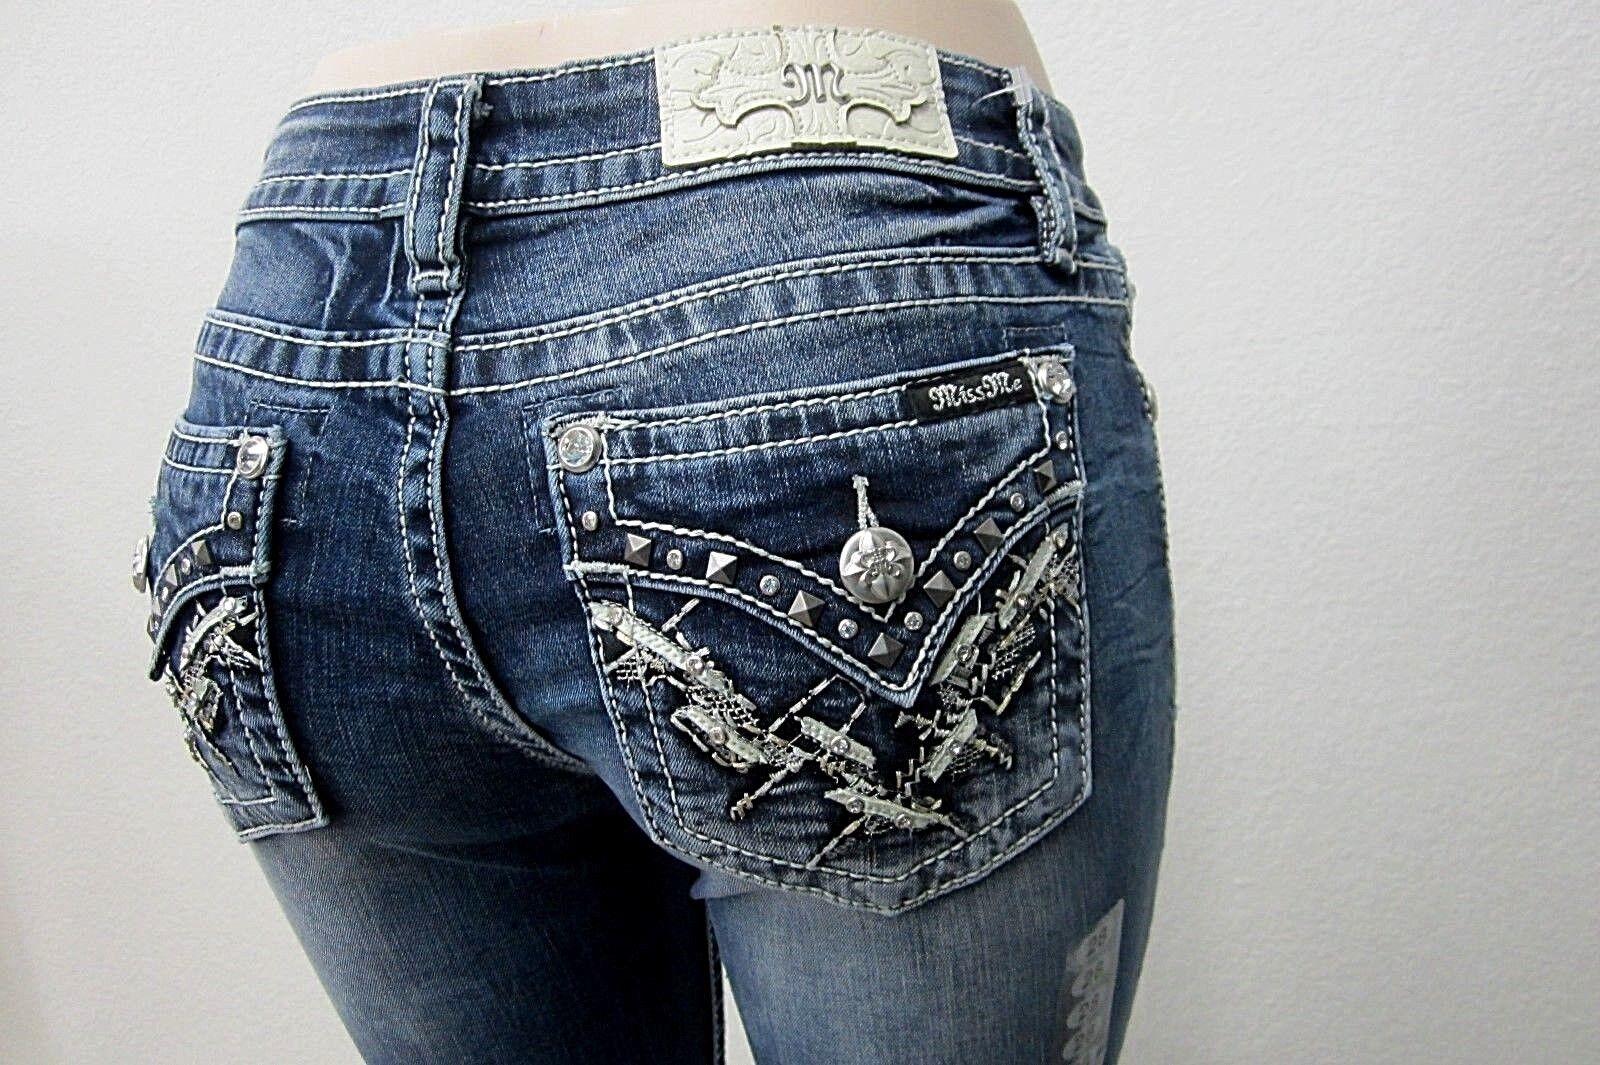 NWT Miss Me CUTE BLING Womens Boot Cut Denim bluee Jeans M3171B Size 30 X 34